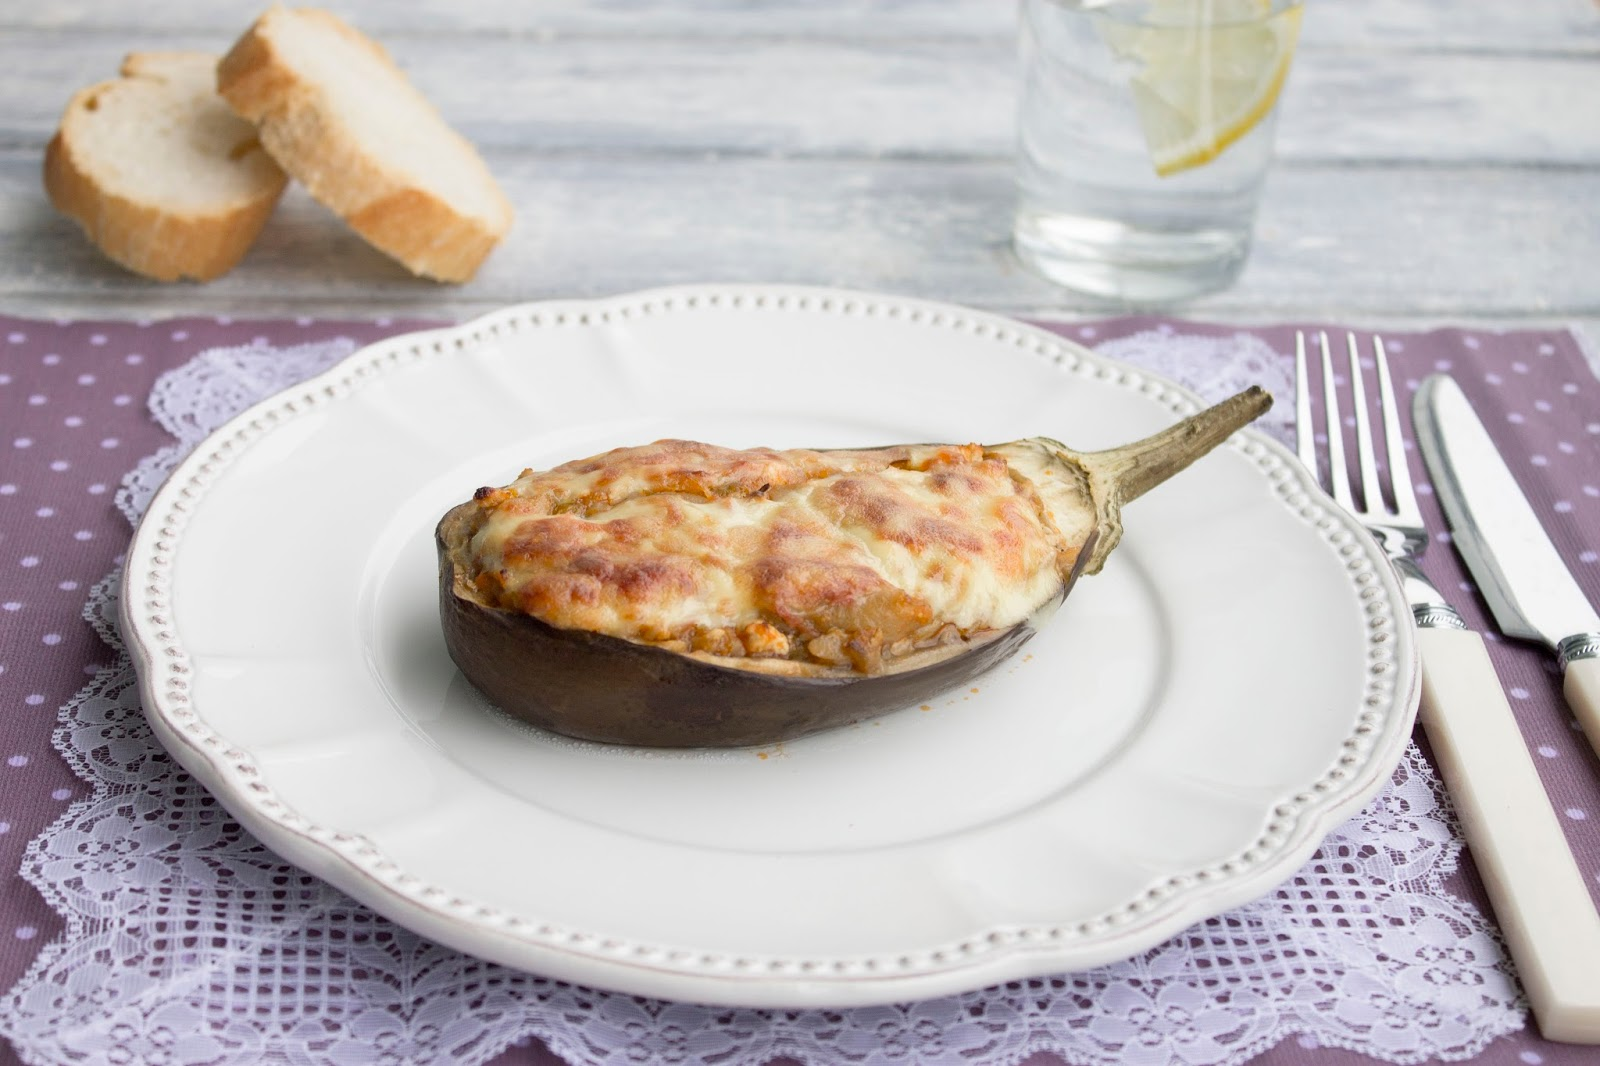 Cocina con angi berenjenas rellenas de pollo for Cocina berenjenas rellenas